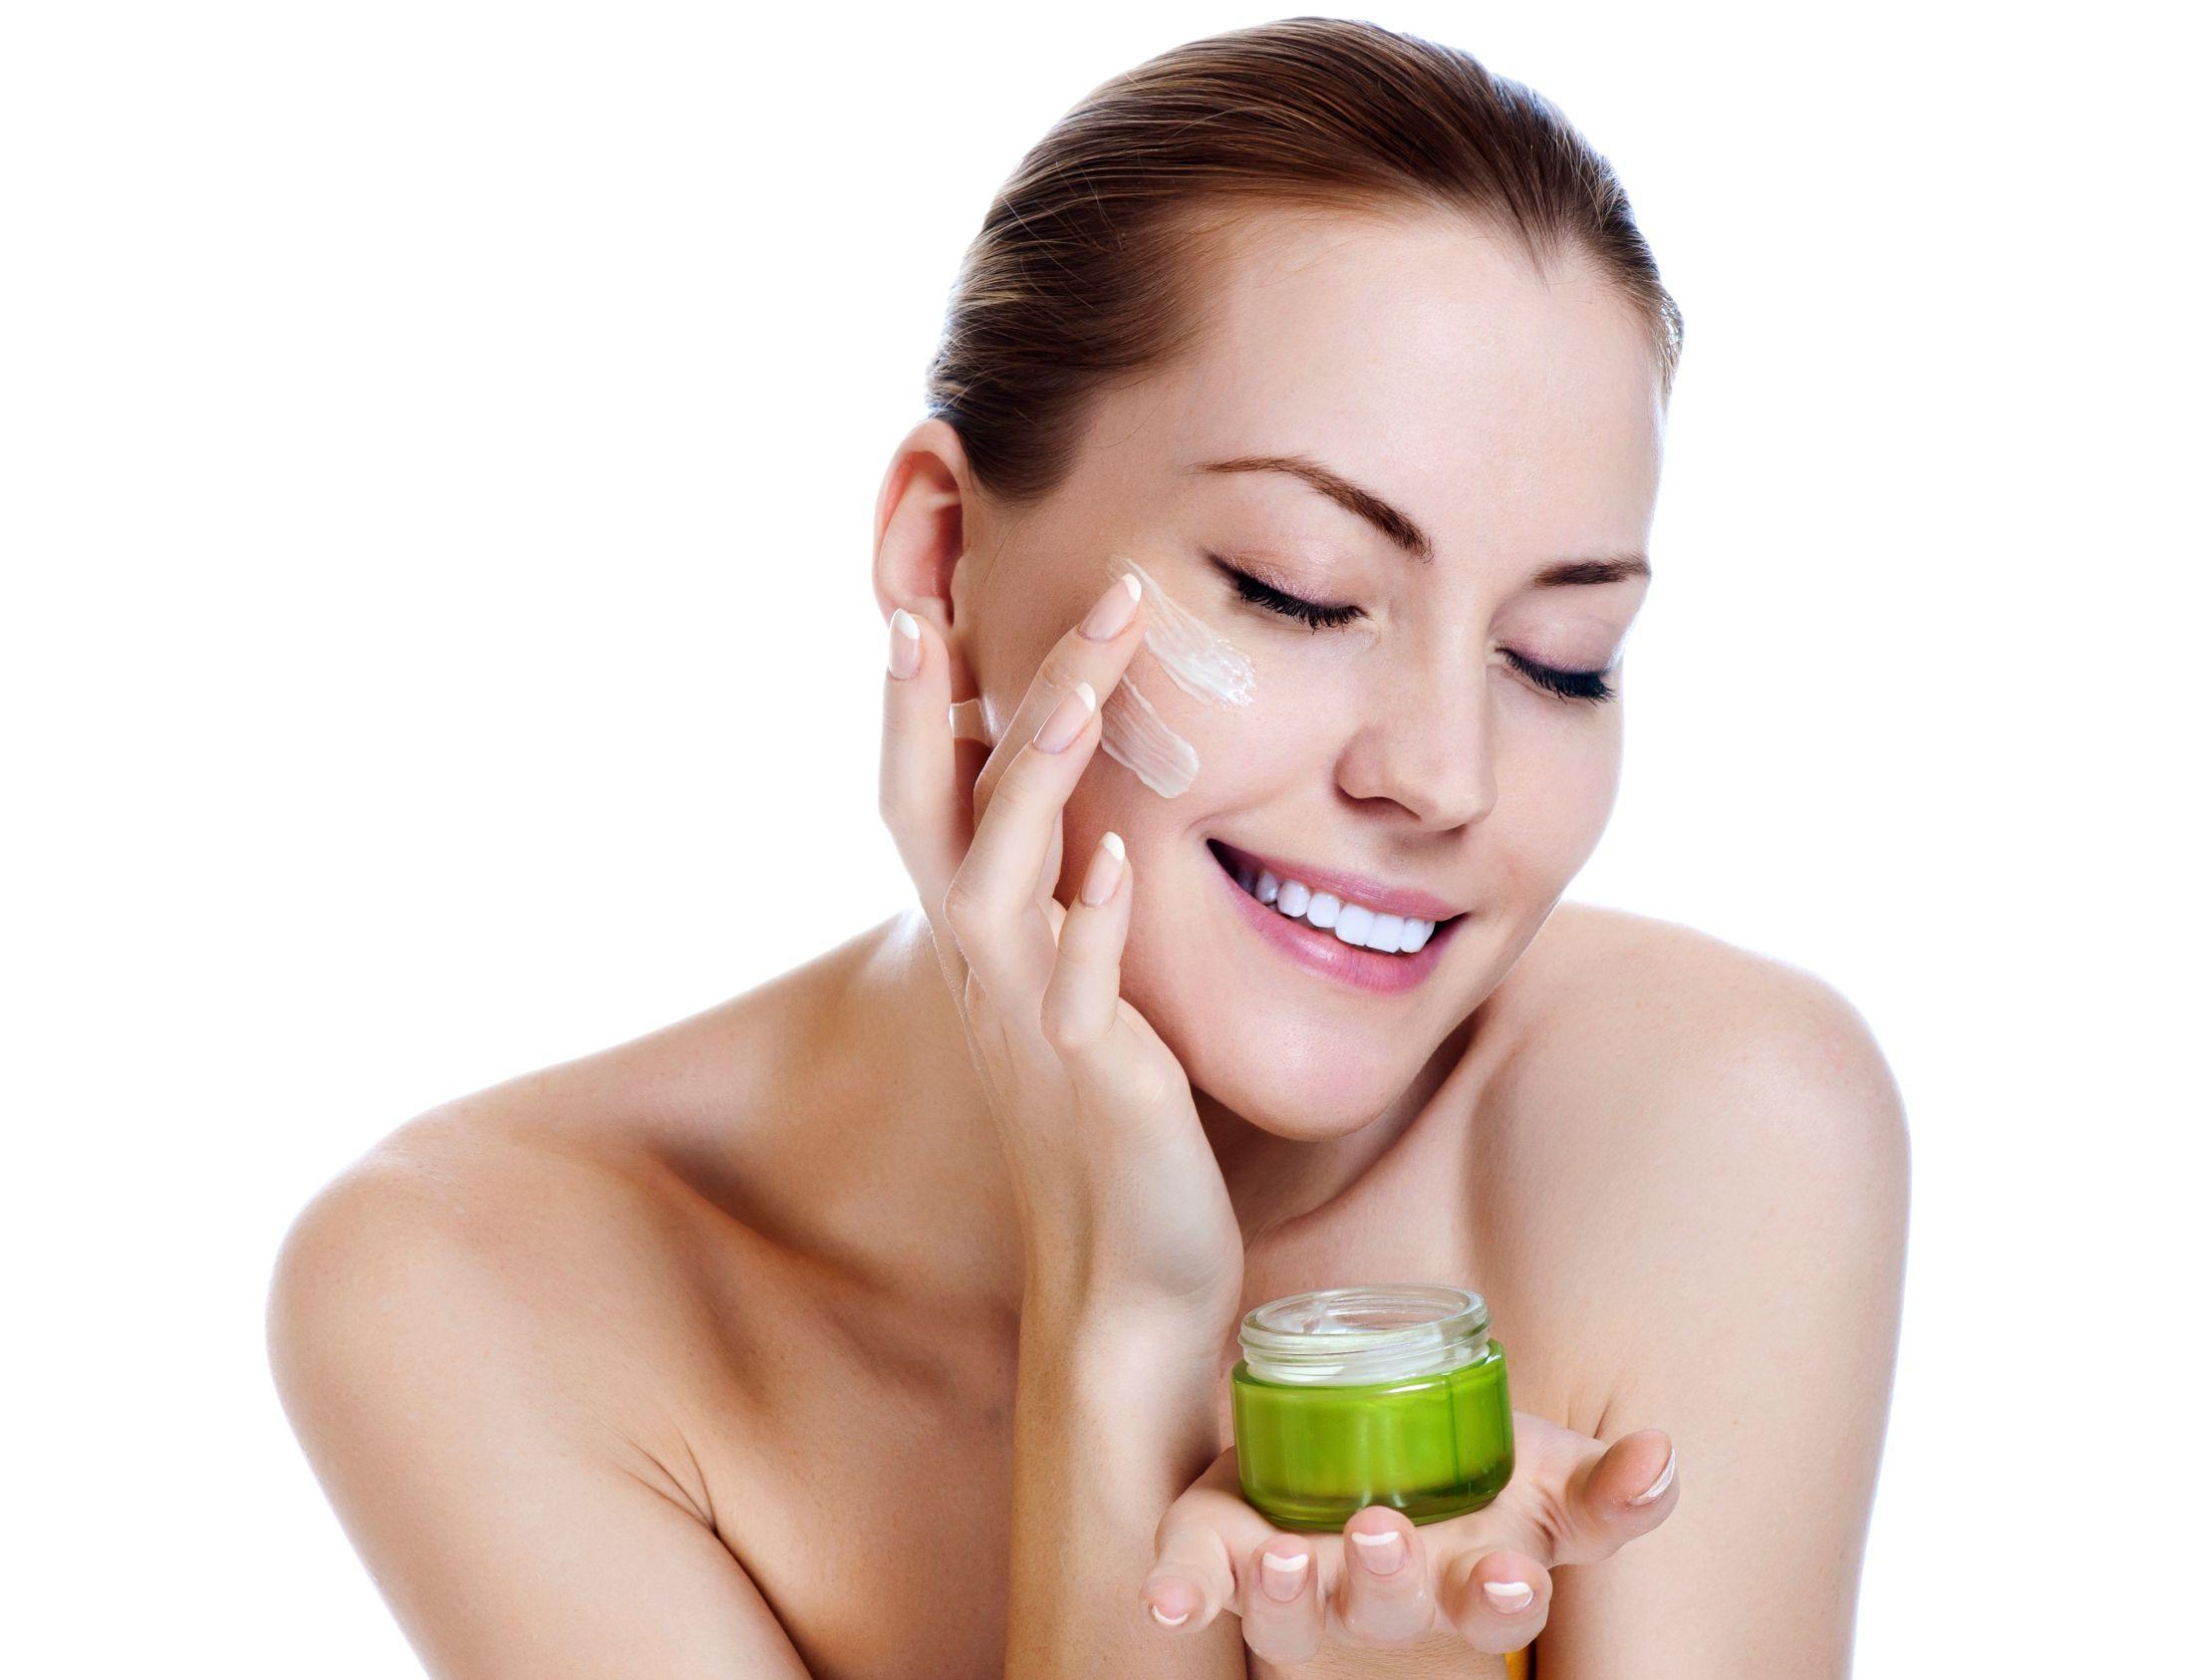 Private Dermatologist privatedermatol on Pinterest